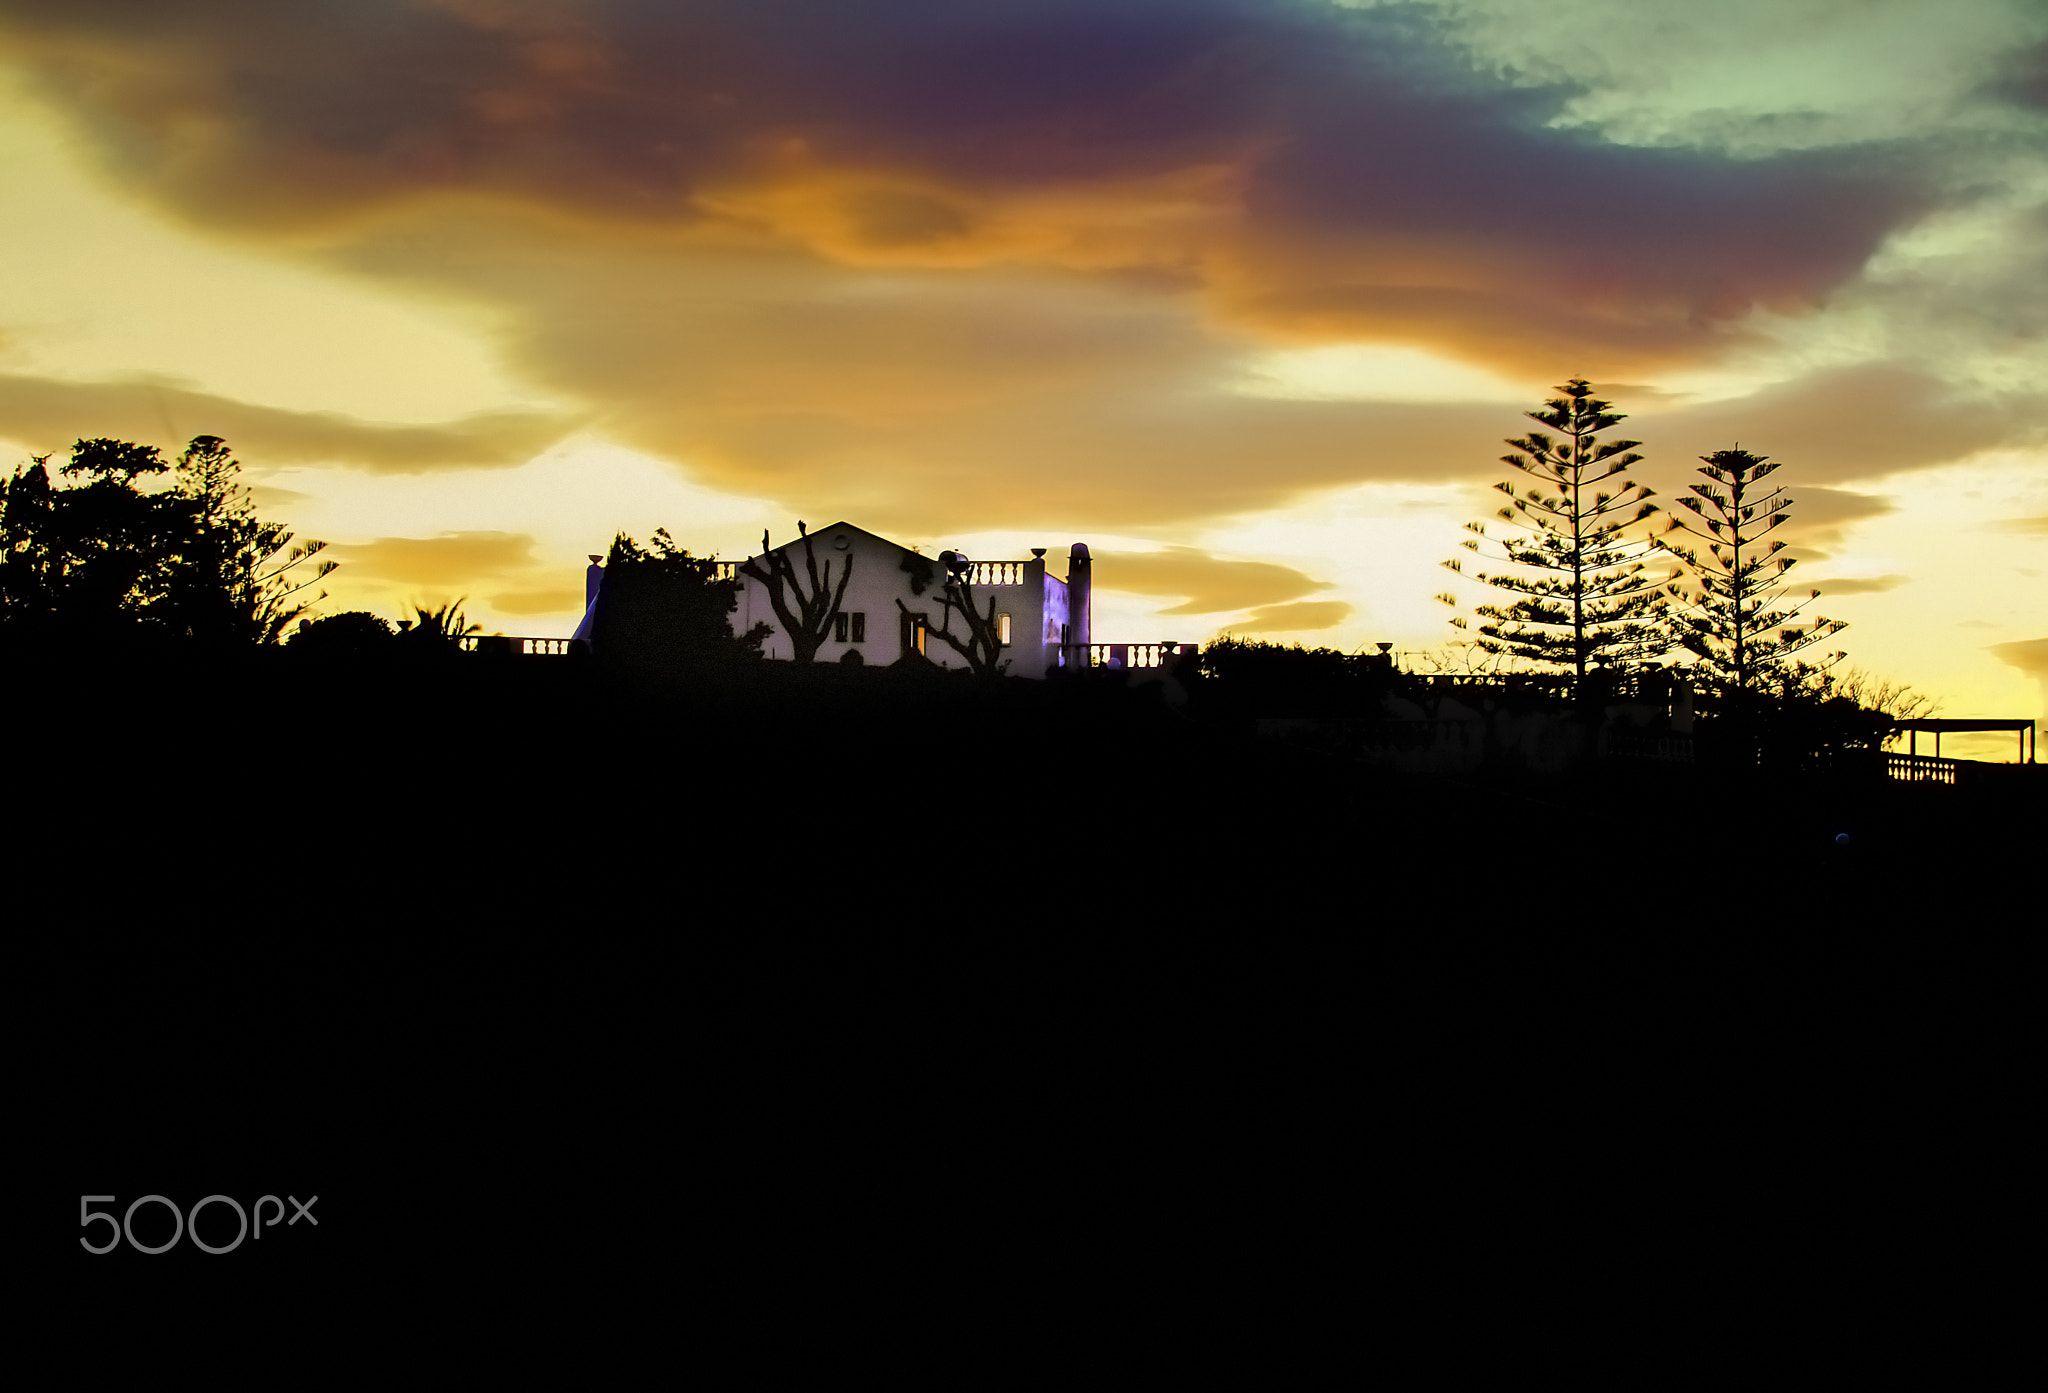 Silhouette Orange Sunset Silhouette Orange Sunset Landscape Photography Sunset Silhouette Landscape Photography